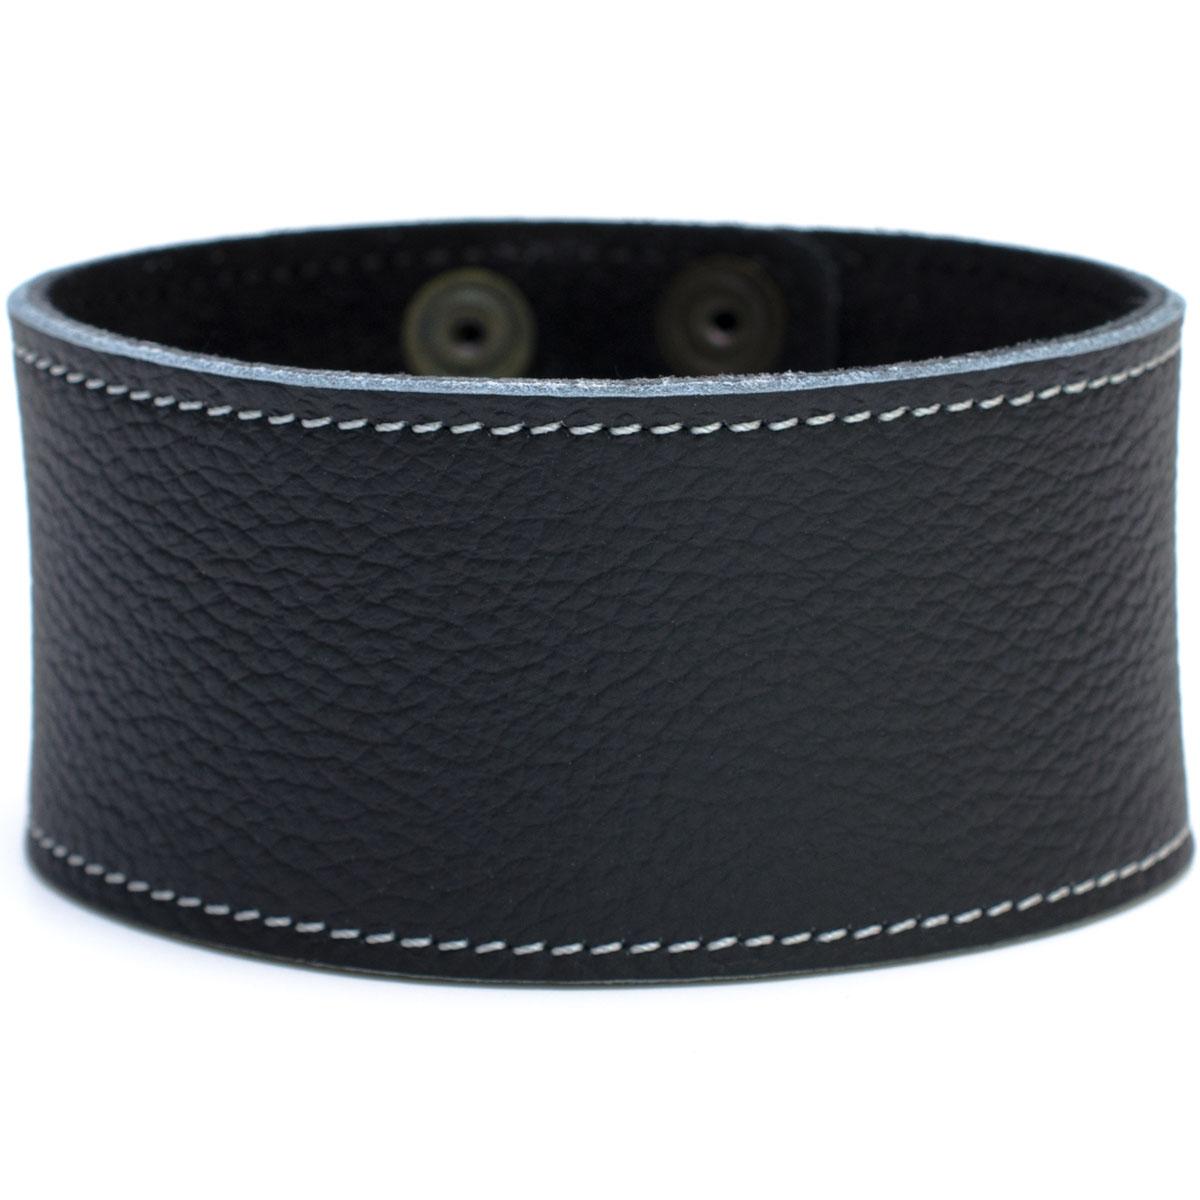 Lederarmband damen schwarz  Lederarmband Damen breit echt Leder Armband Regular